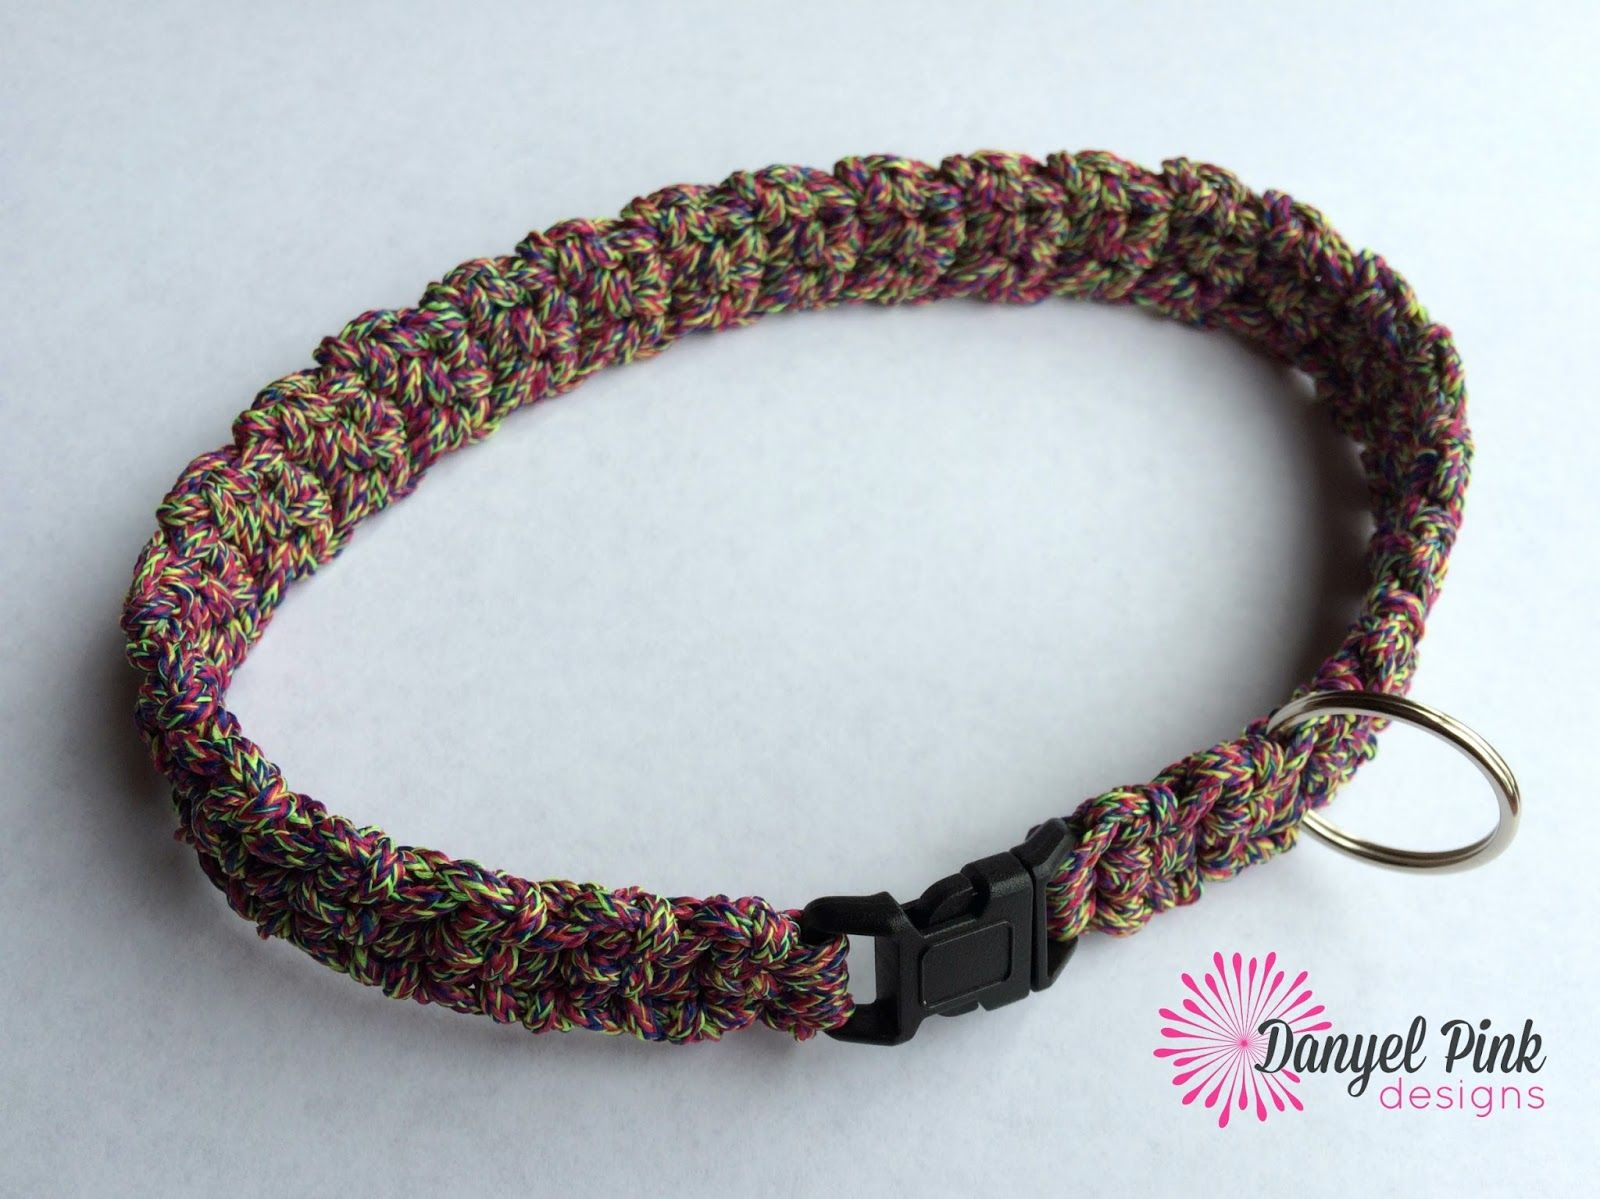 Danyel pink designs free crochet pattern cordial pet collar danyel pink designs free crochet pattern cordial pet collar jeuxipadfo Gallery